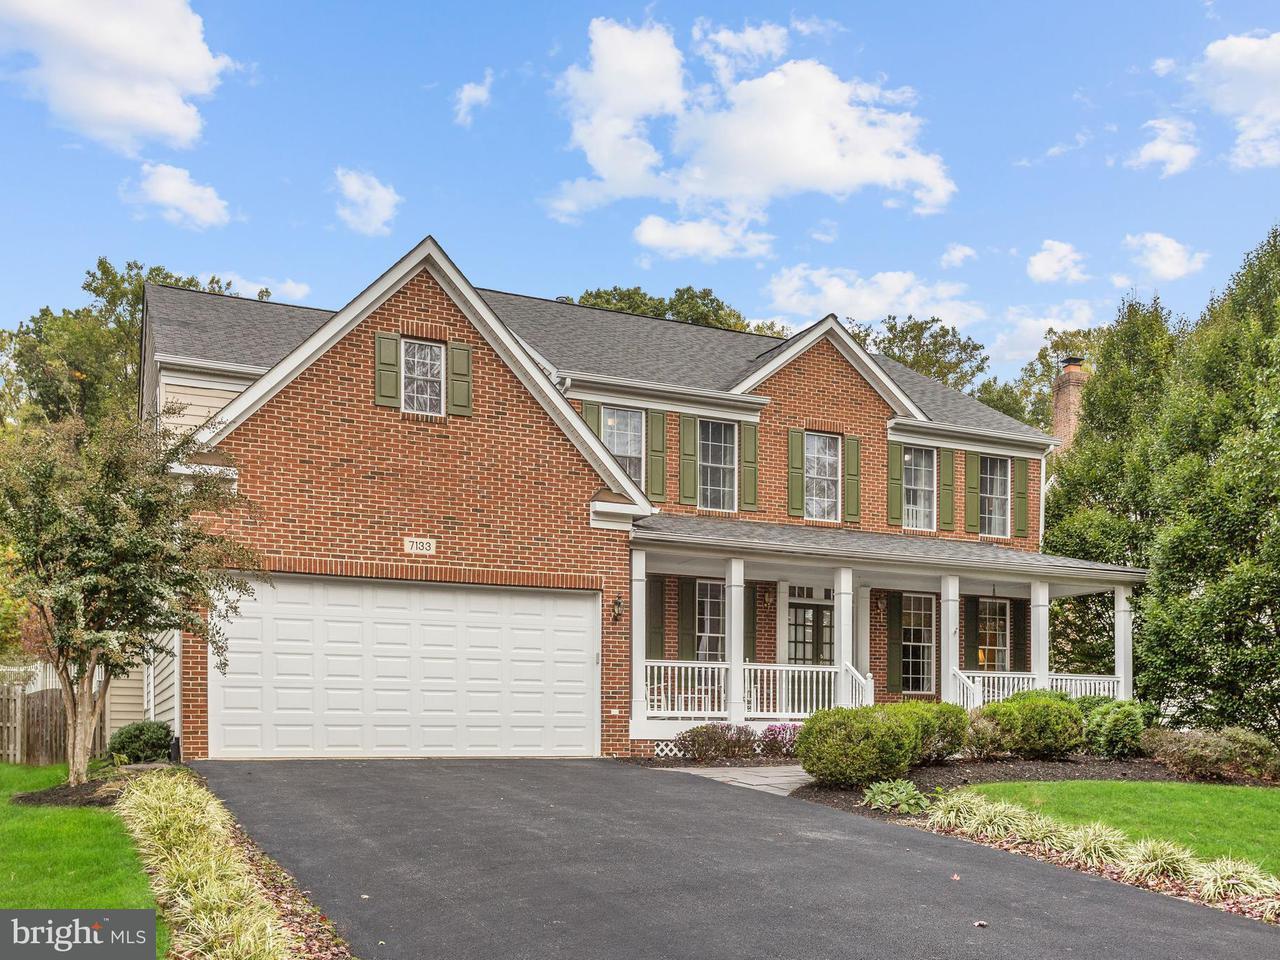 Single Family Home for Sale at 7133 COLLINGWOOD Court 7133 COLLINGWOOD Court Elkridge, Maryland 21075 United States